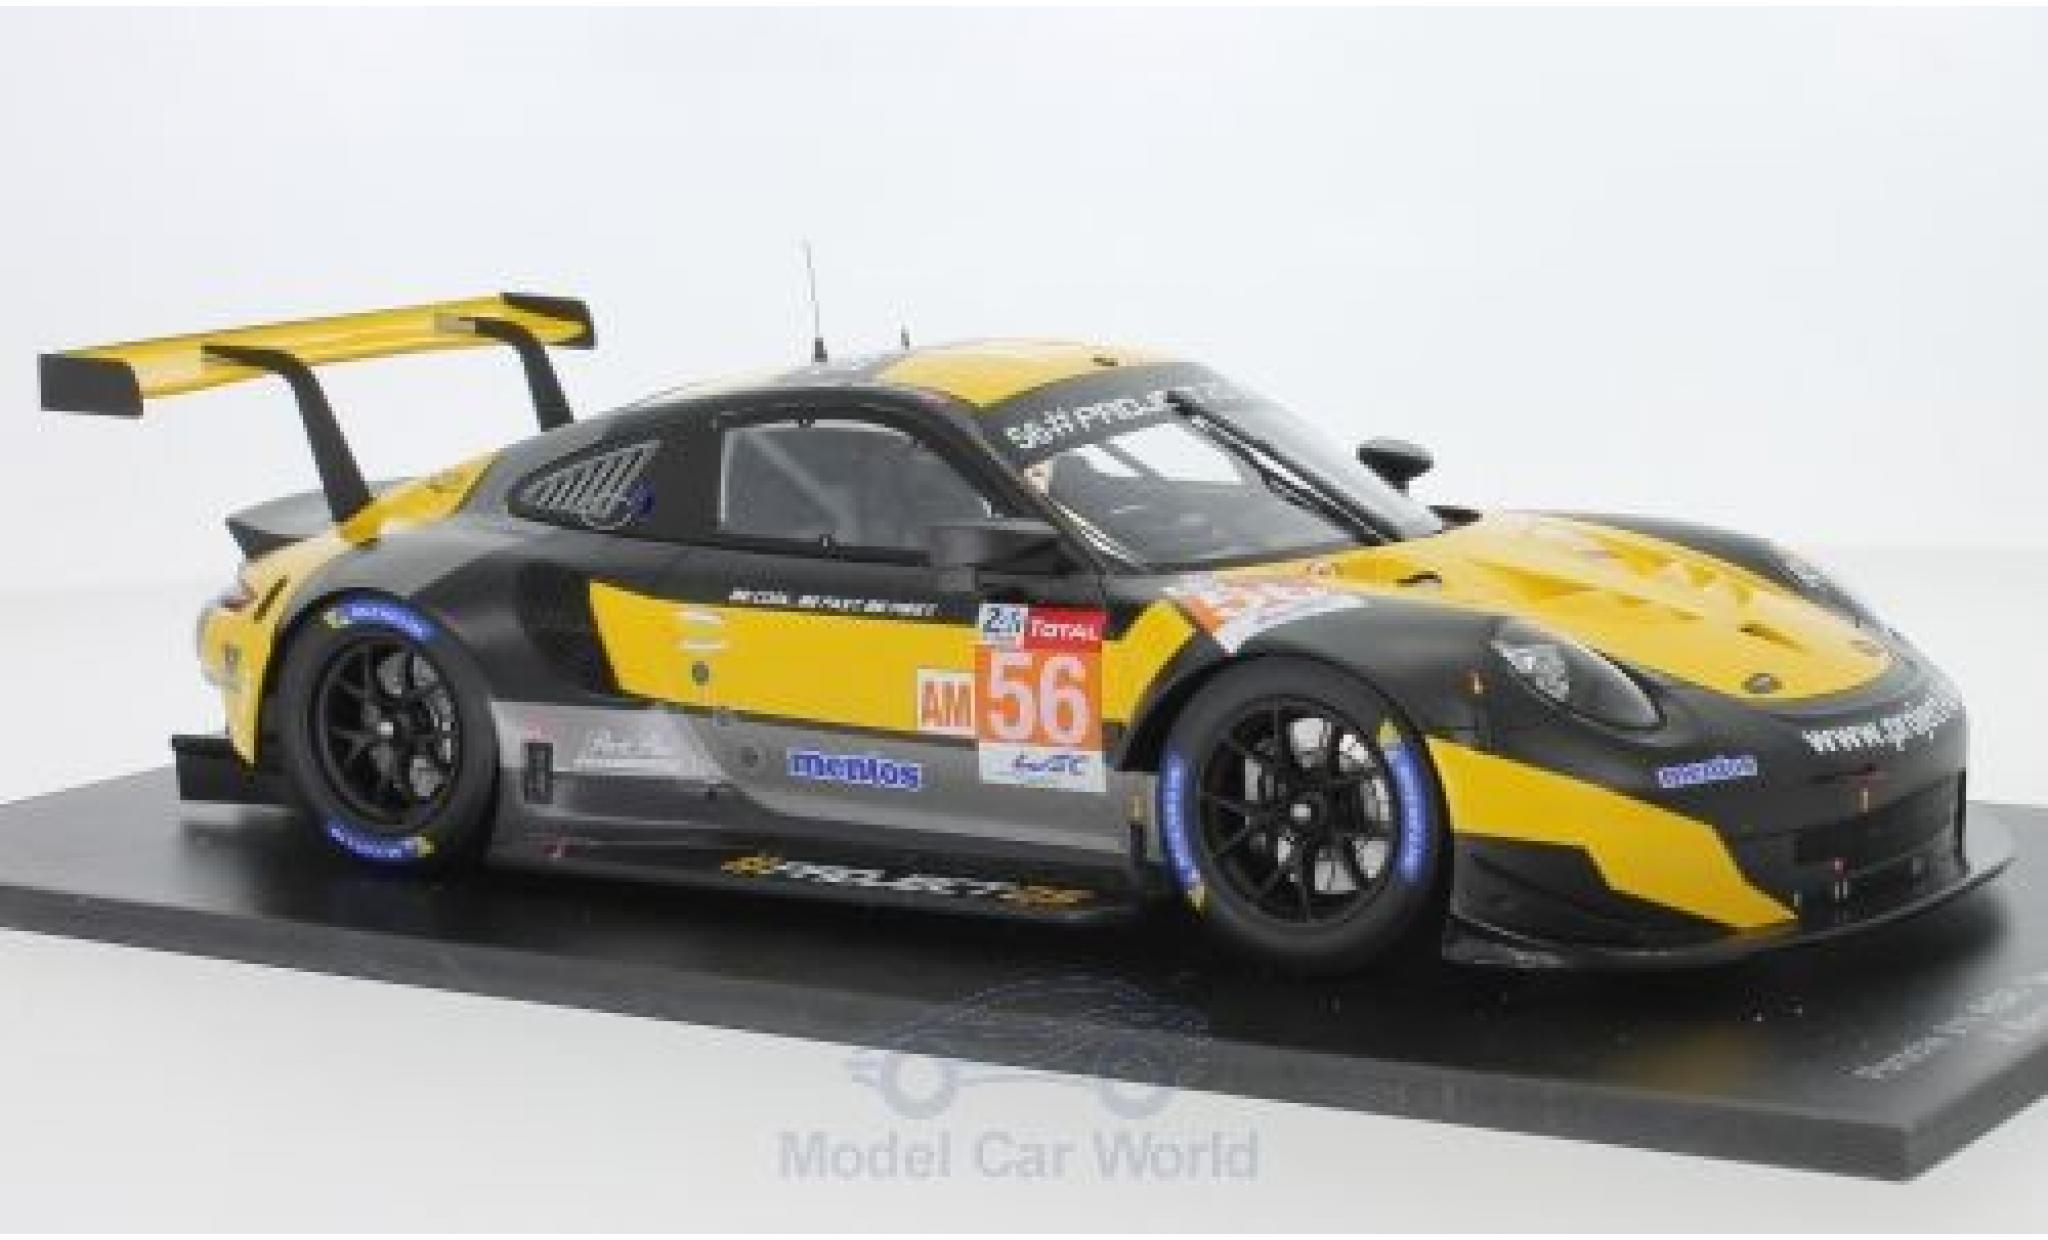 Porsche 991 RSR 1/18 Spark 911 No.56 Team Project 1 24h Le Mans 2018 J.Bergmeister/P.Lindsey/E.Perfetti